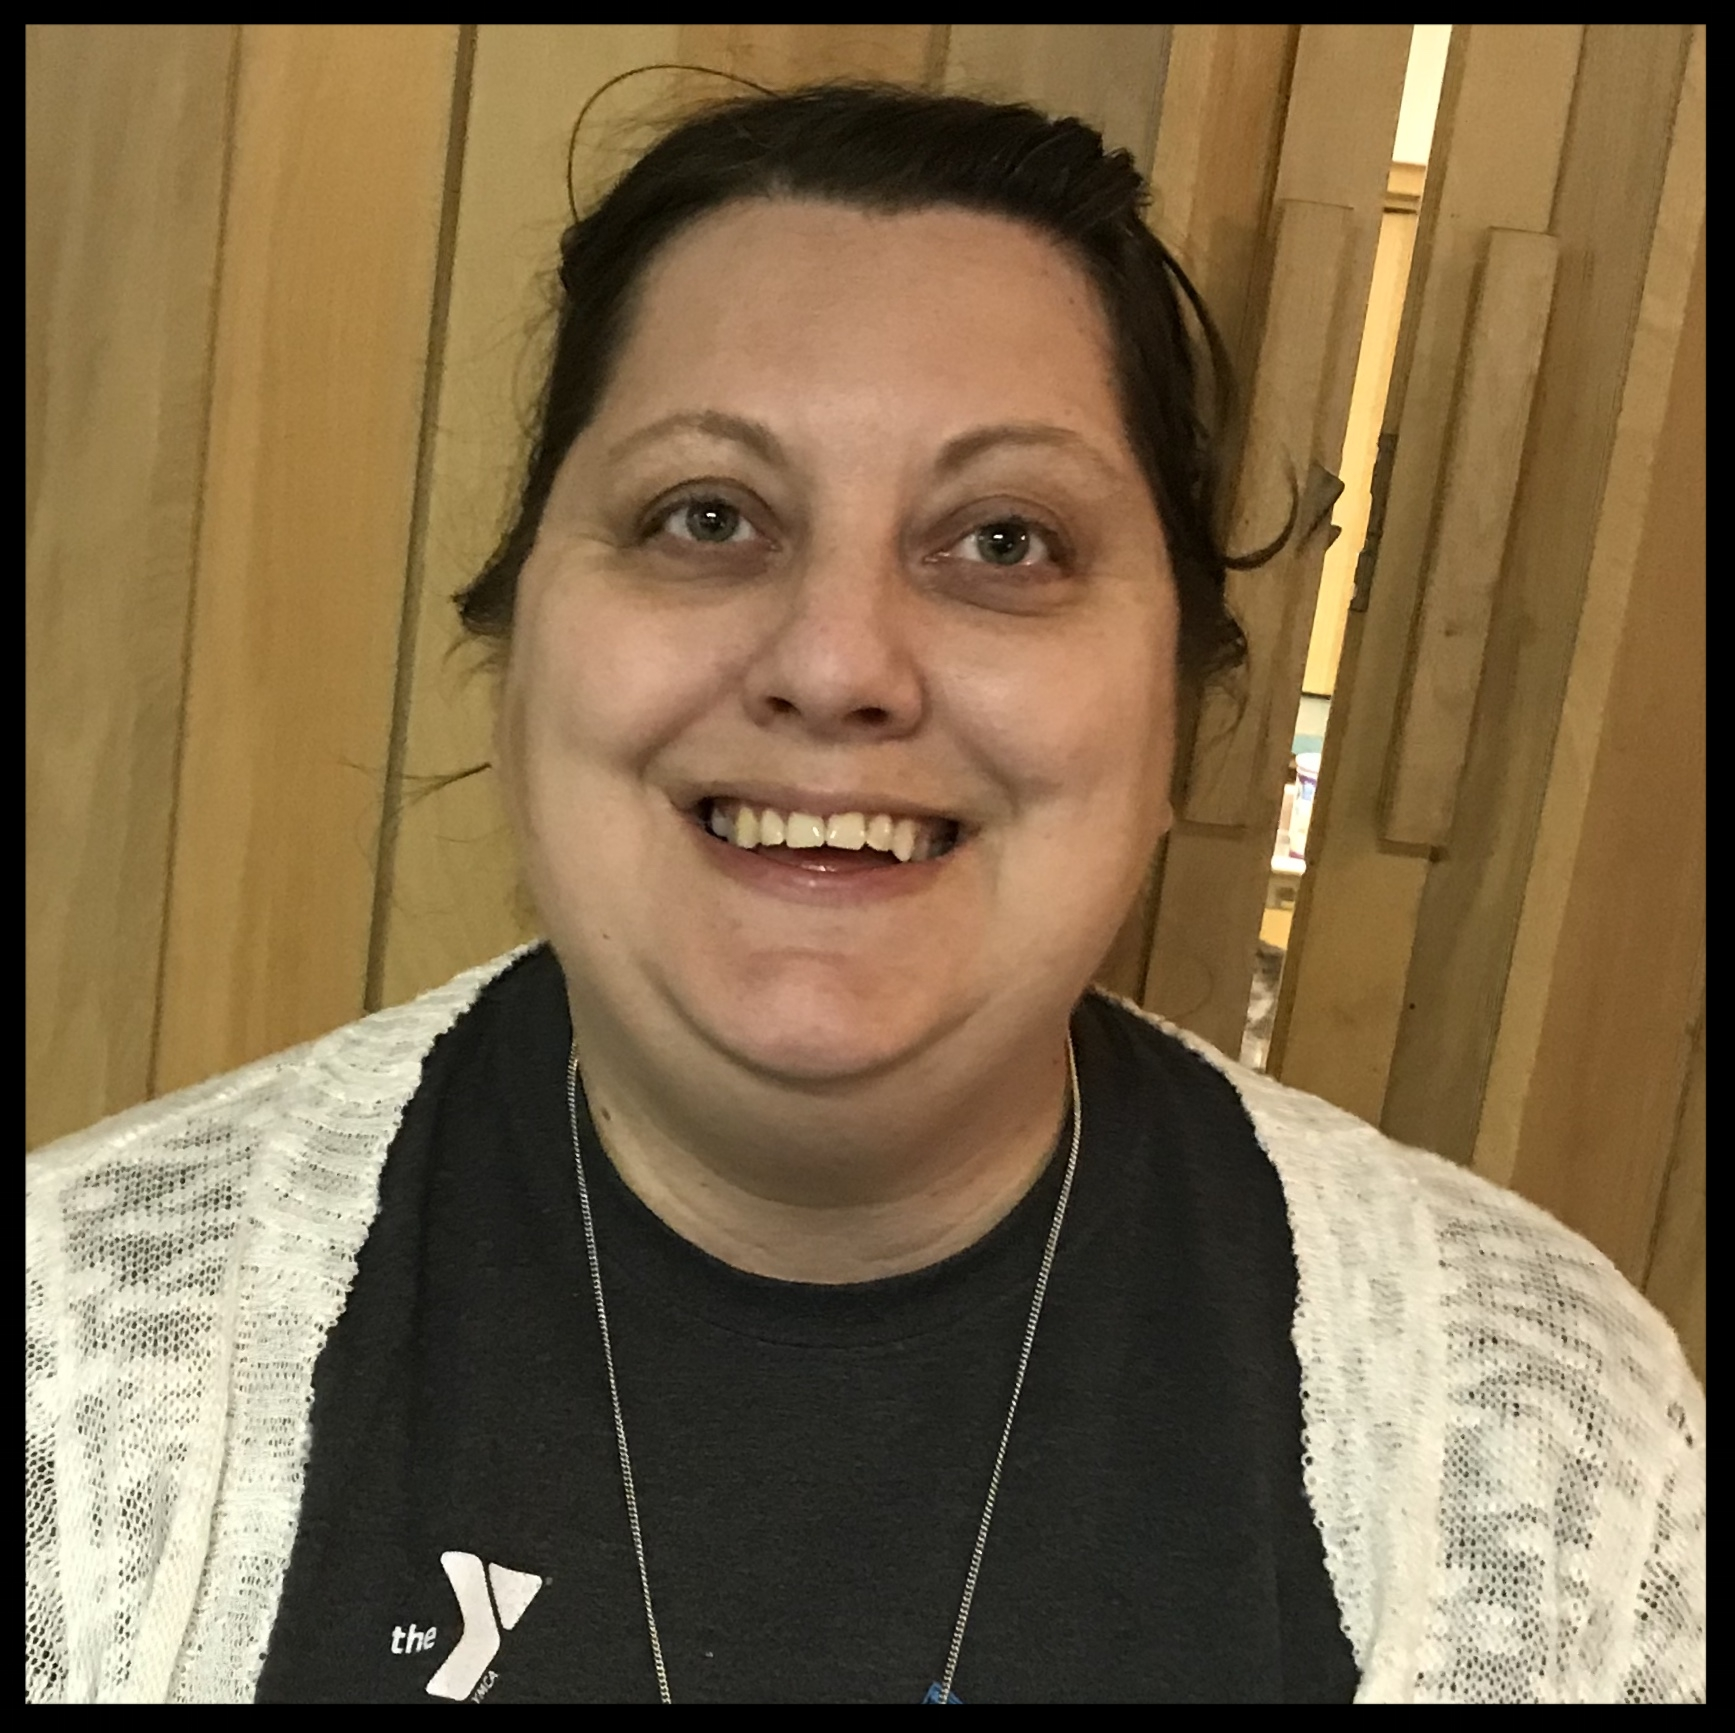 Kathleen Johnson -  Board Member  Email:  payitforwardandsmile@hotmail.com  Phone:  920.530.1840